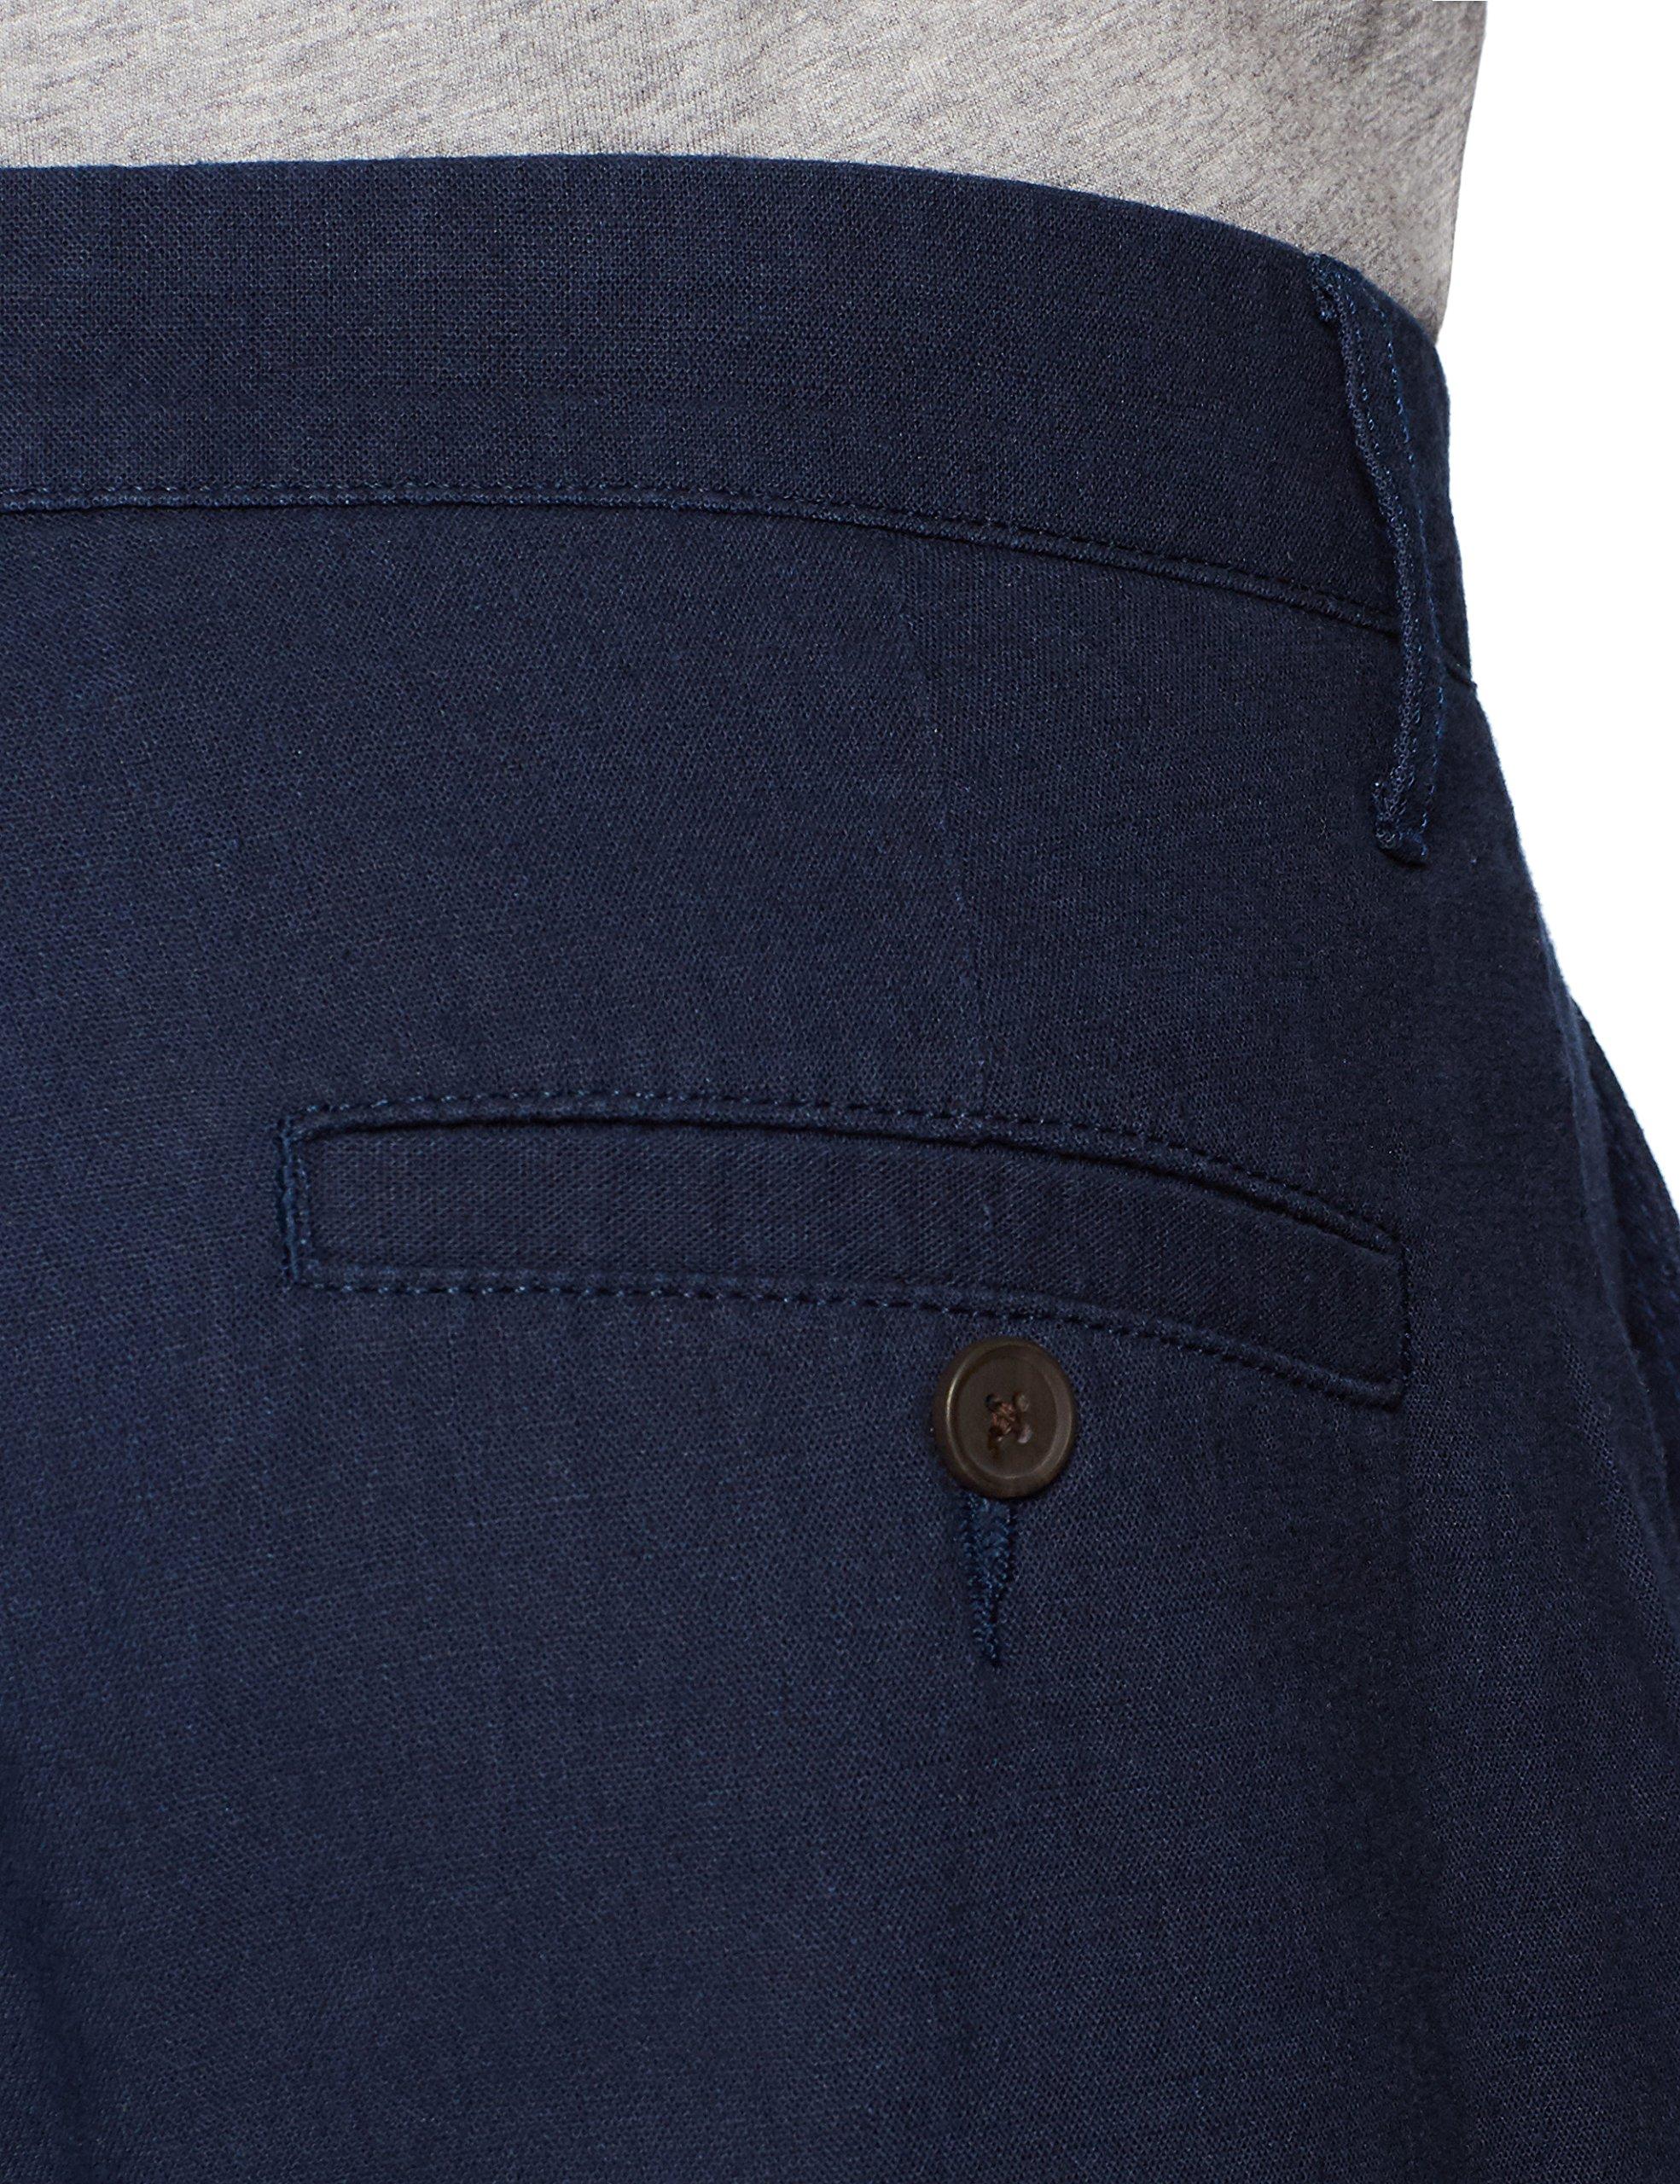 Goodthreads Men's 9'' Inseam Linen Cotton Short, Navy, 34 by Goodthreads (Image #5)